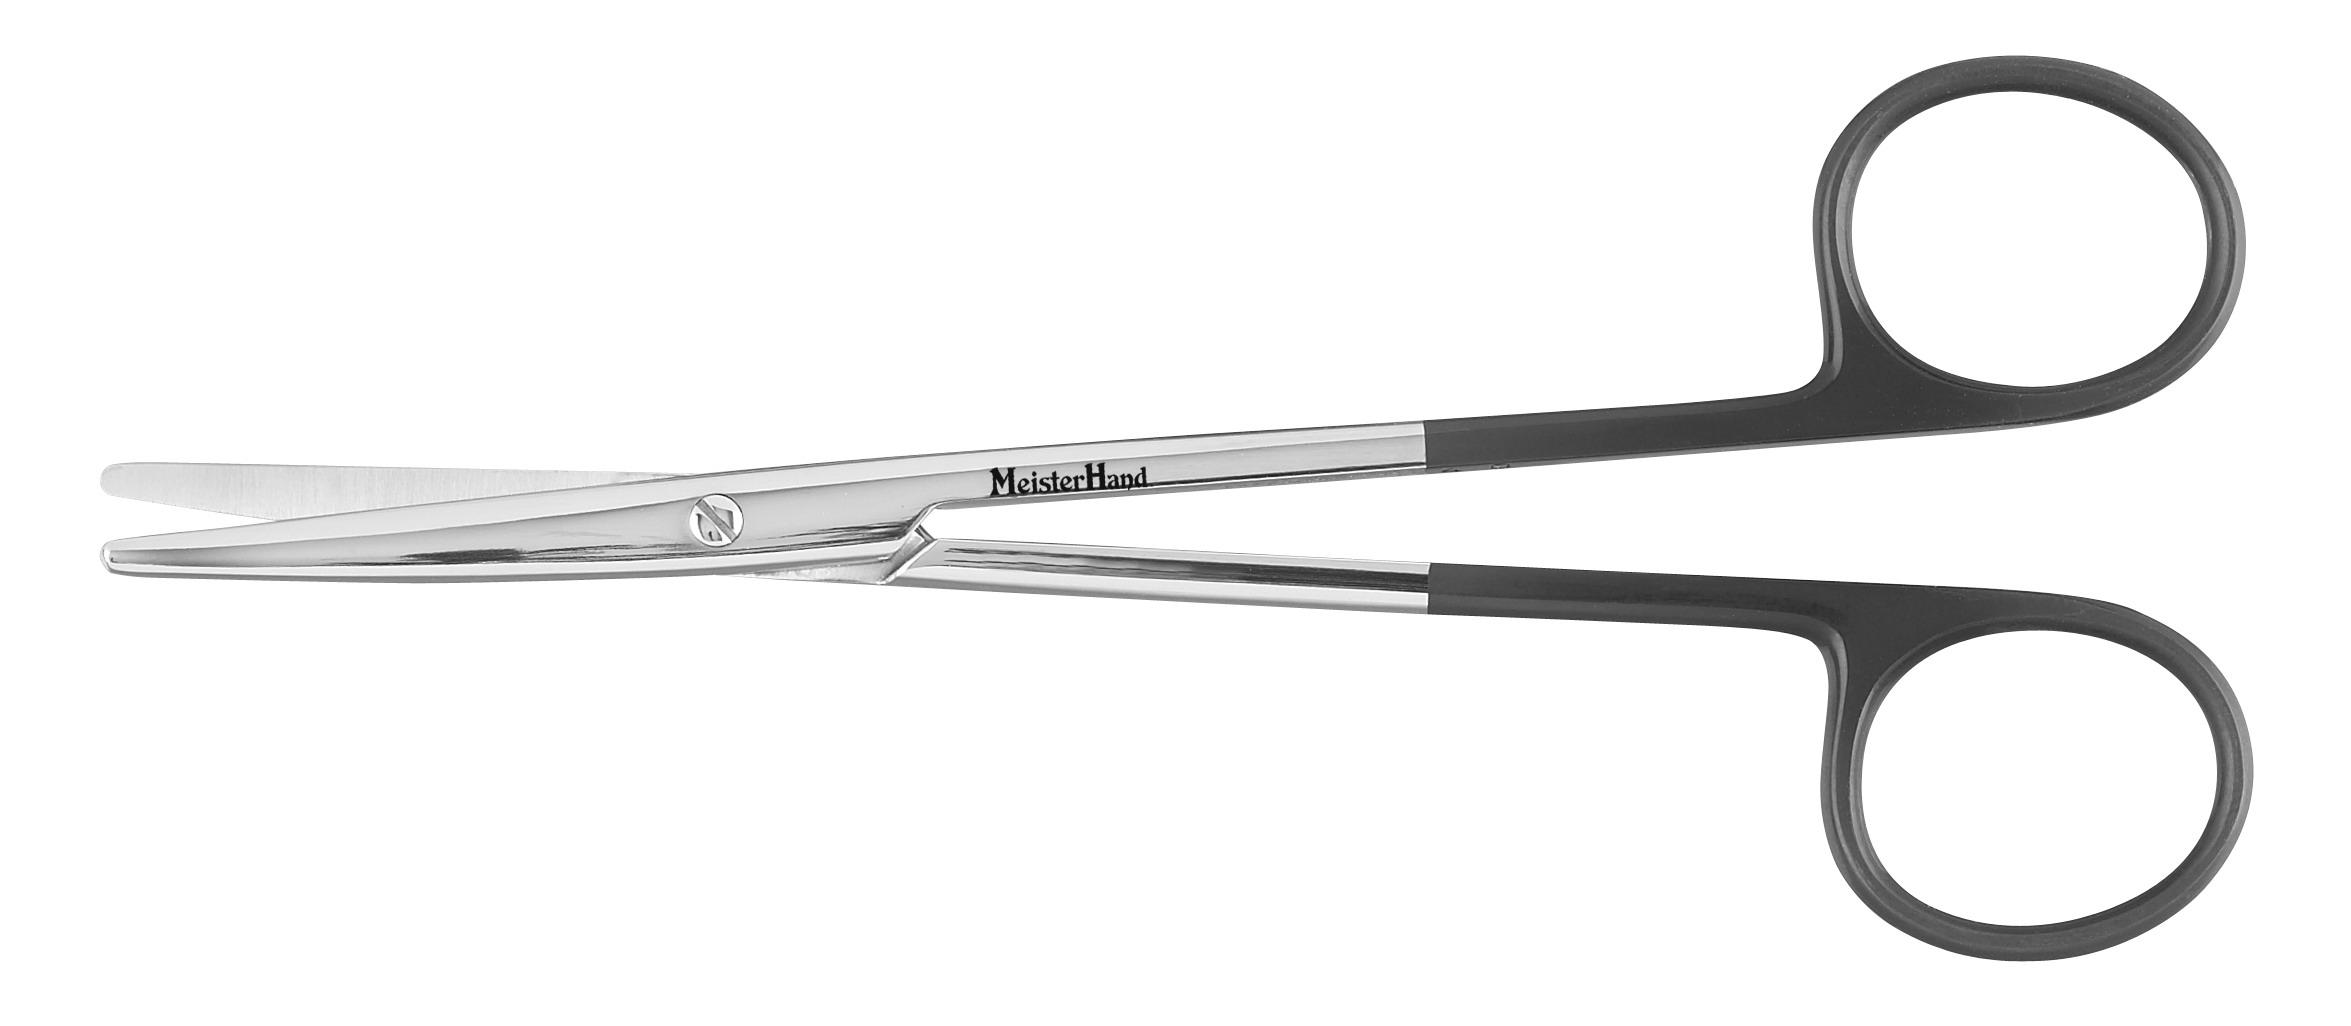 supercut-metzenbaum-scissors-5-1-2-14-cm-curved-mh5-sc-180-miltex.jpg